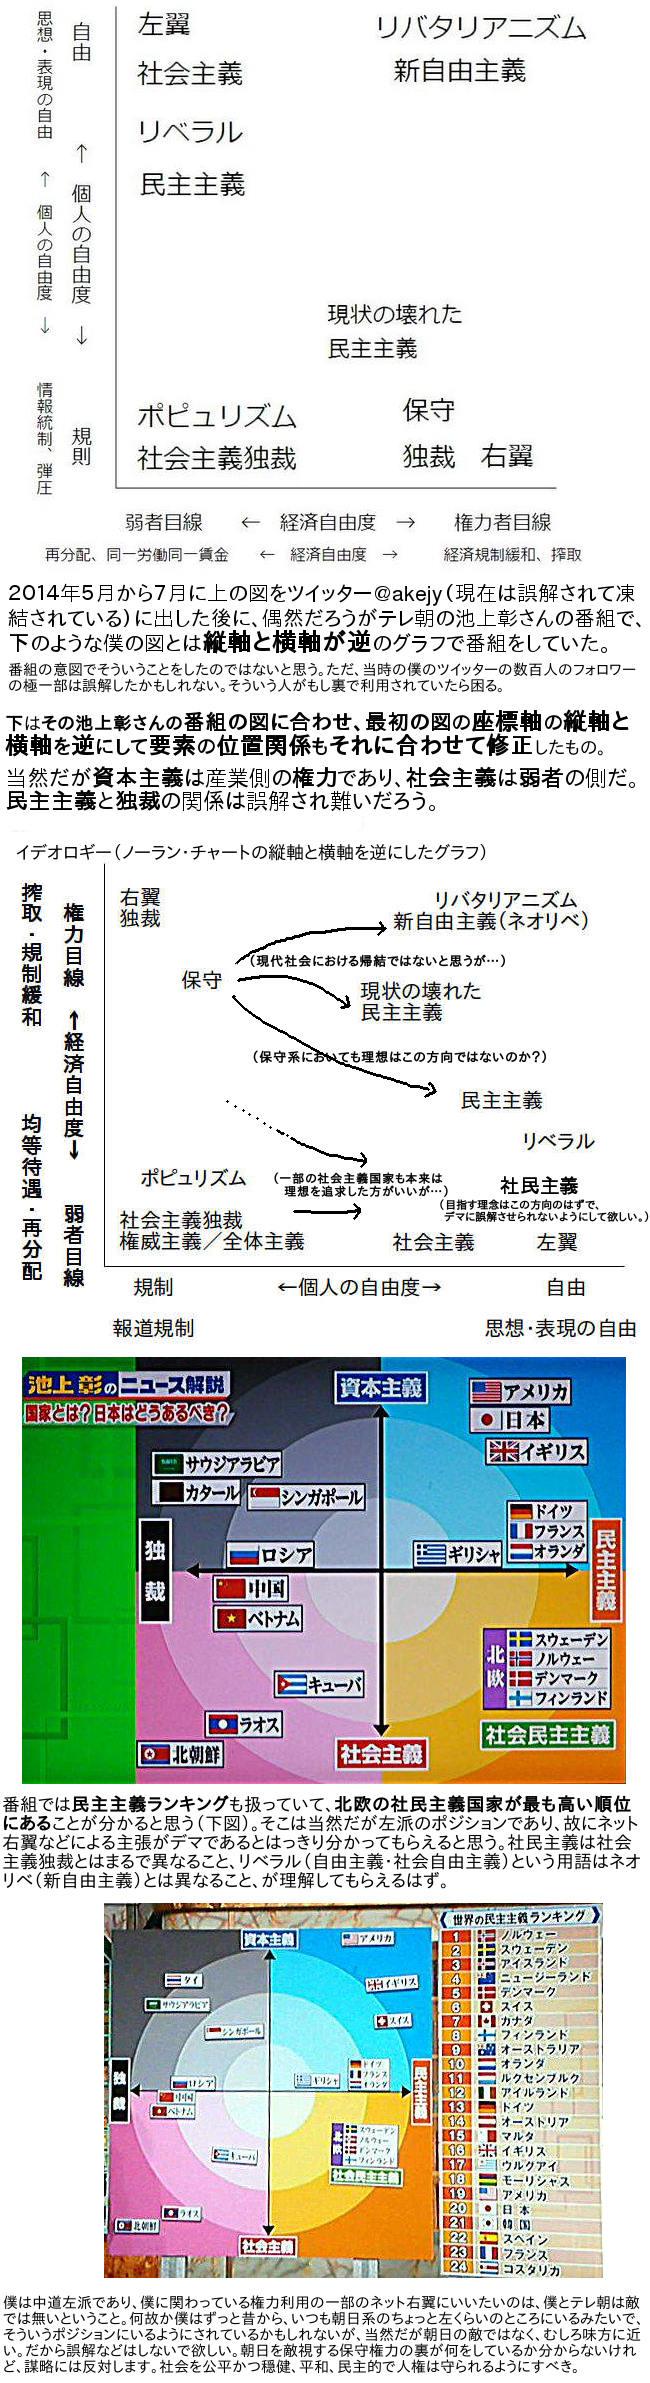 political-spectrum_2014.jpg